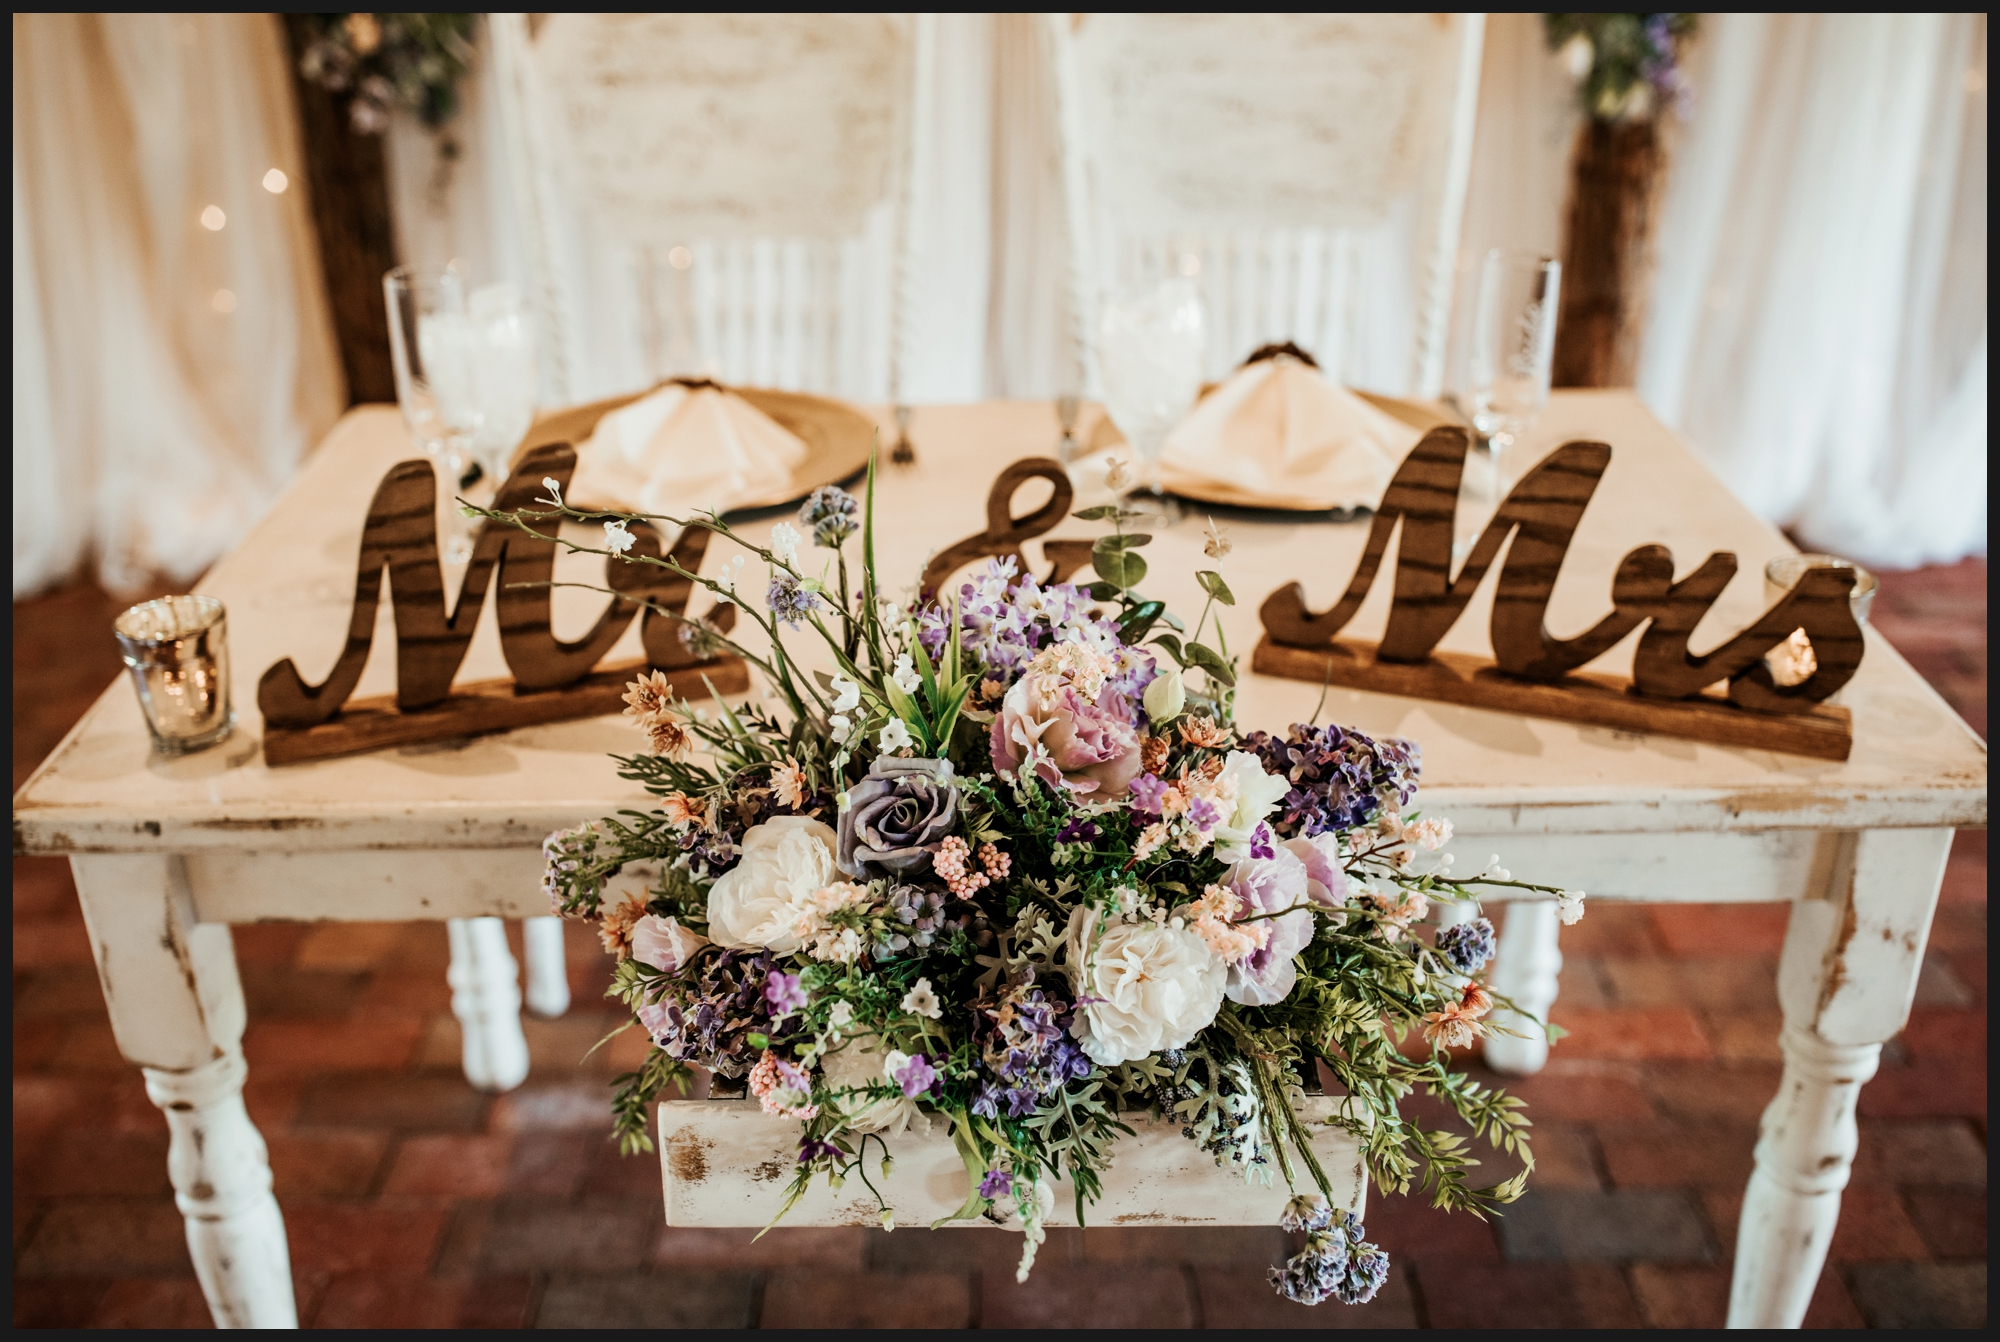 Orlando-Wedding-Photographer-destination-wedding-photographer-florida-wedding-photographer-bohemian-wedding-photographer_1632.jpg